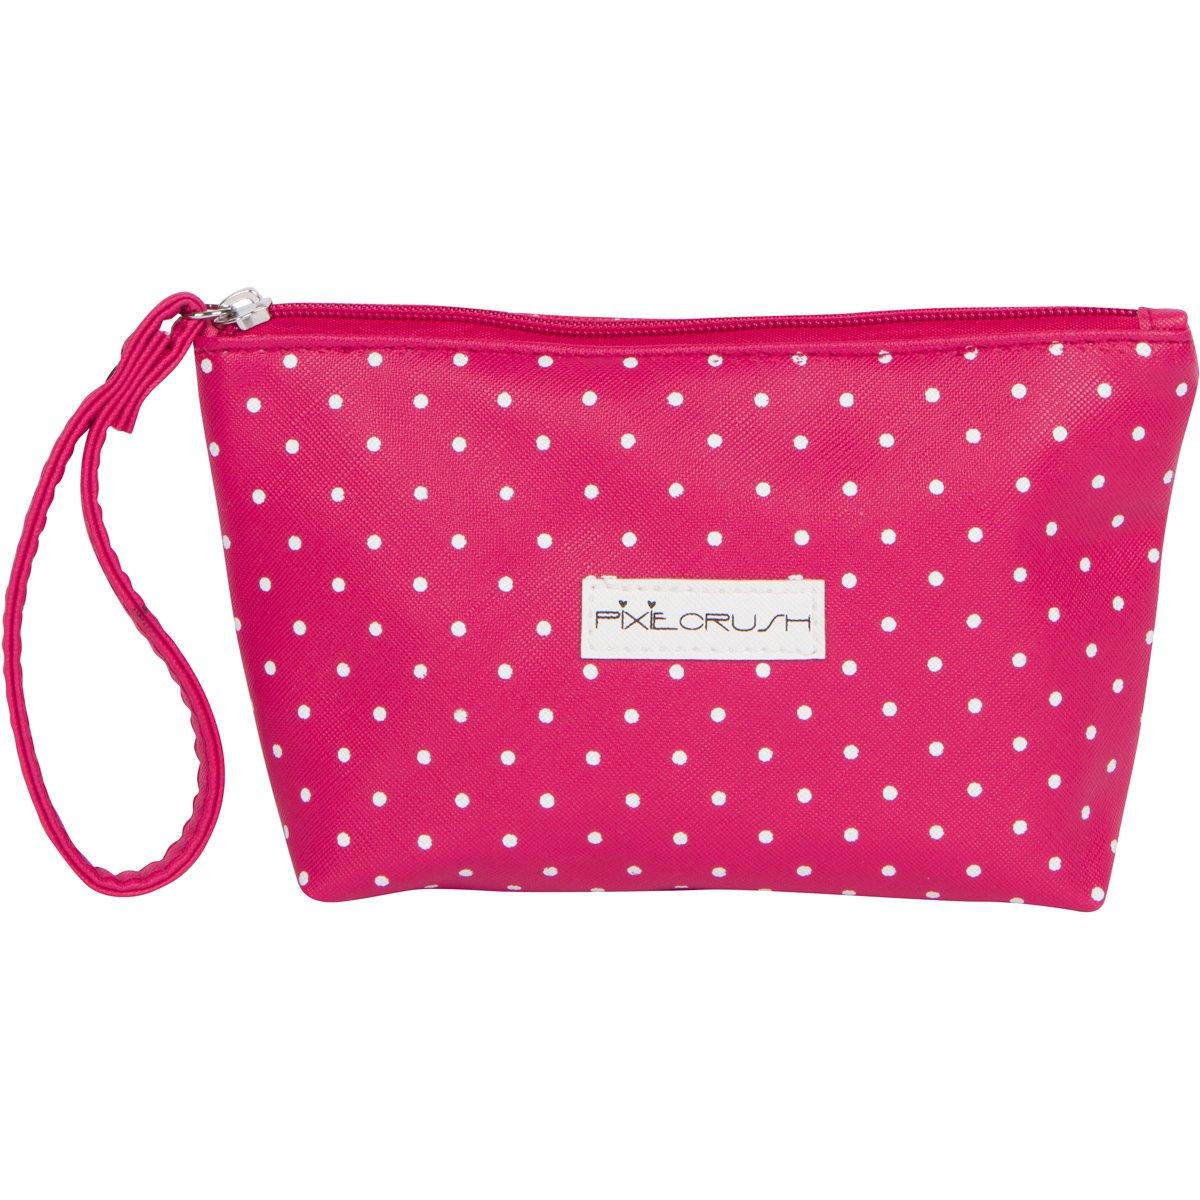 PixieCrush Pretend Play Cosmetic and Makeup Set. 13 Piece Designer Kit with Pink Polka Dot Handbag by PixieCrush (Image #4)